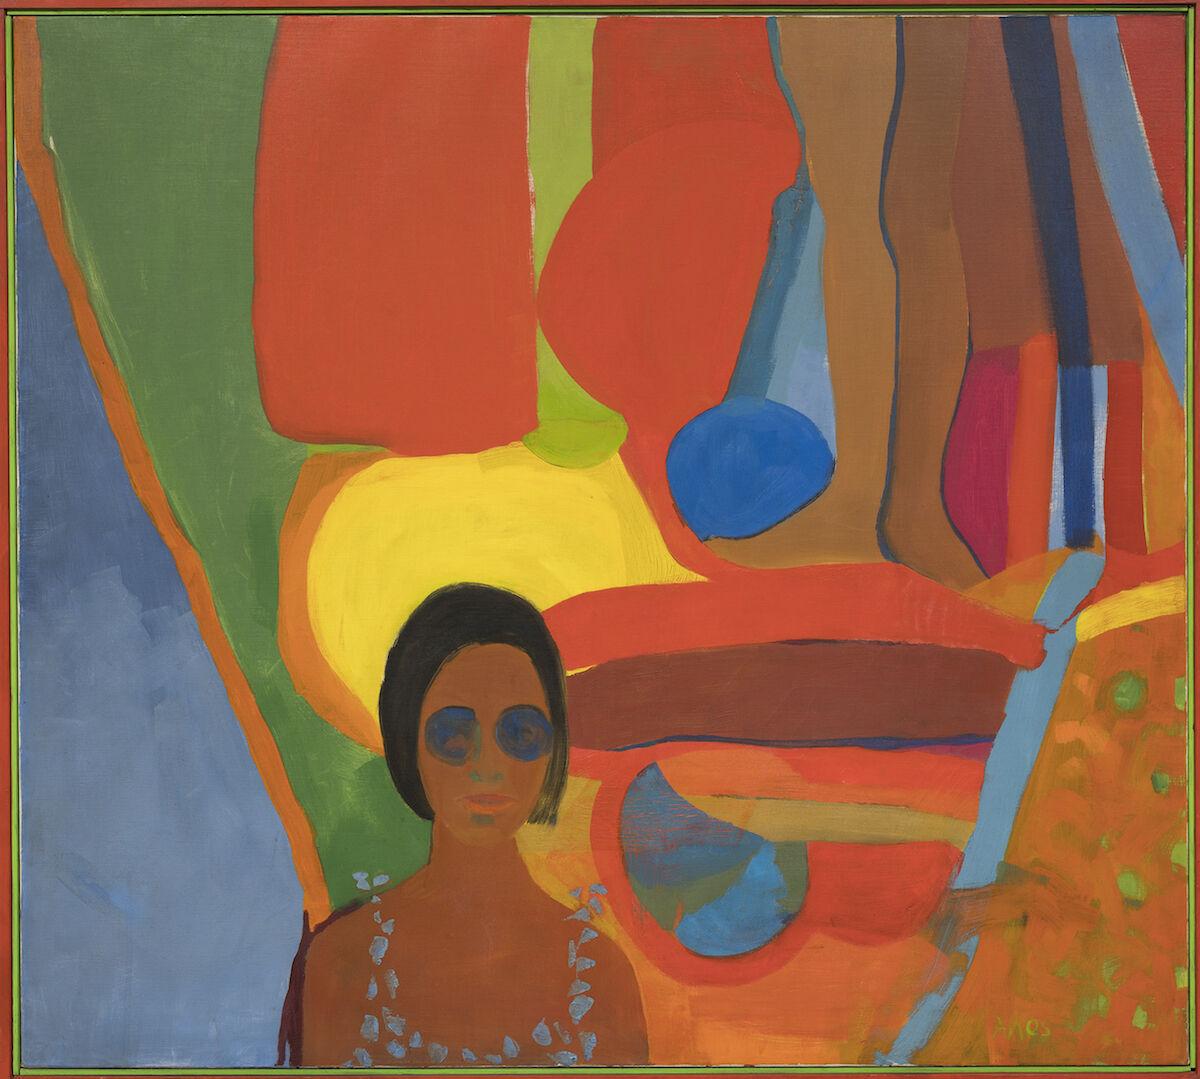 Emma Amos, Baby, 1966, oil on canvas. © Emma Amos; courtesy the artist and RYAN LEE Gallery, New York.